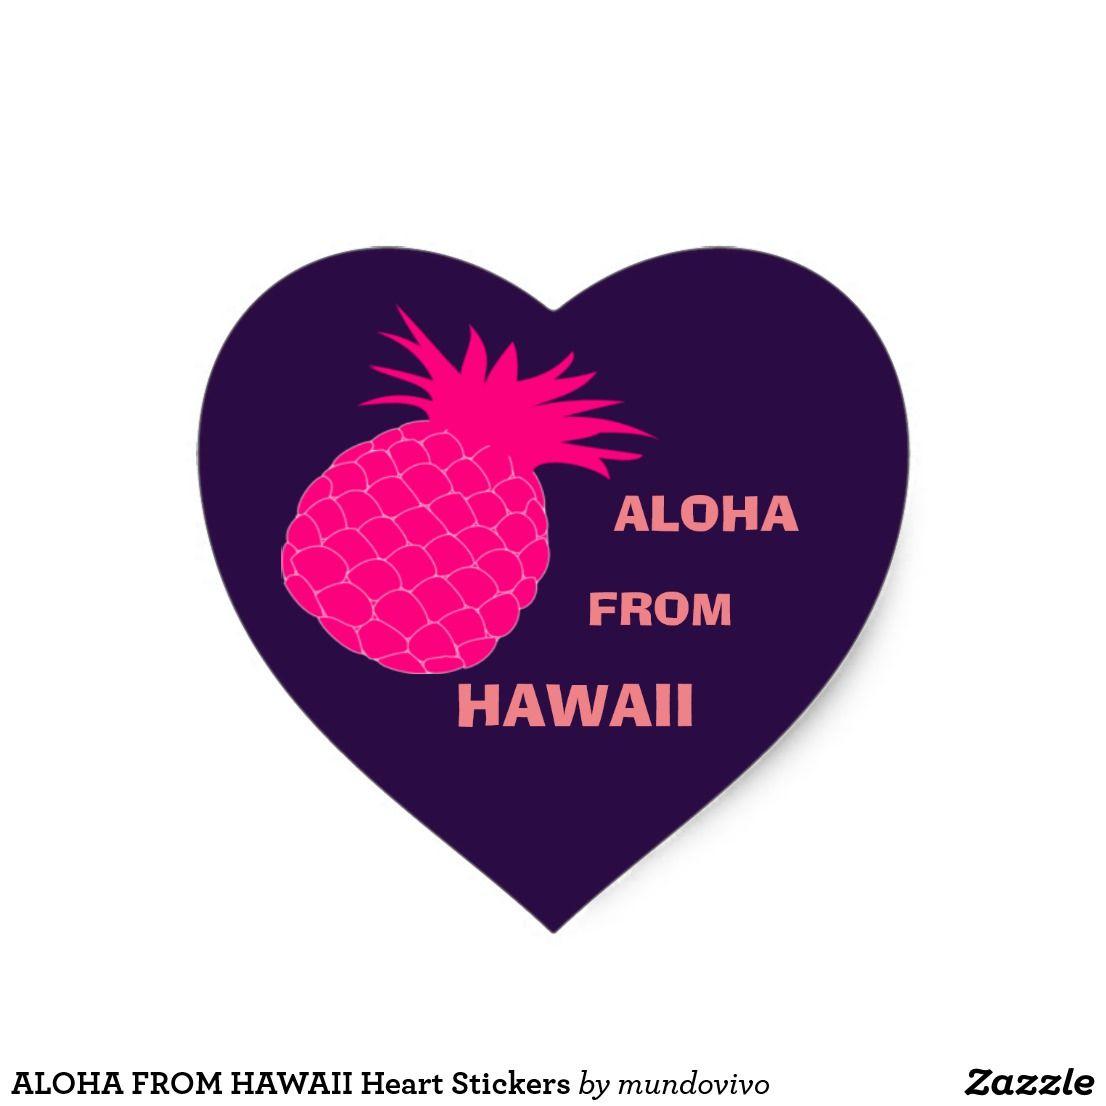 Aloha From Hawaii Heart Stickers Zazzle Com Heart Stickers Print Stickers Create Custom Stickers [ 1106 x 1106 Pixel ]